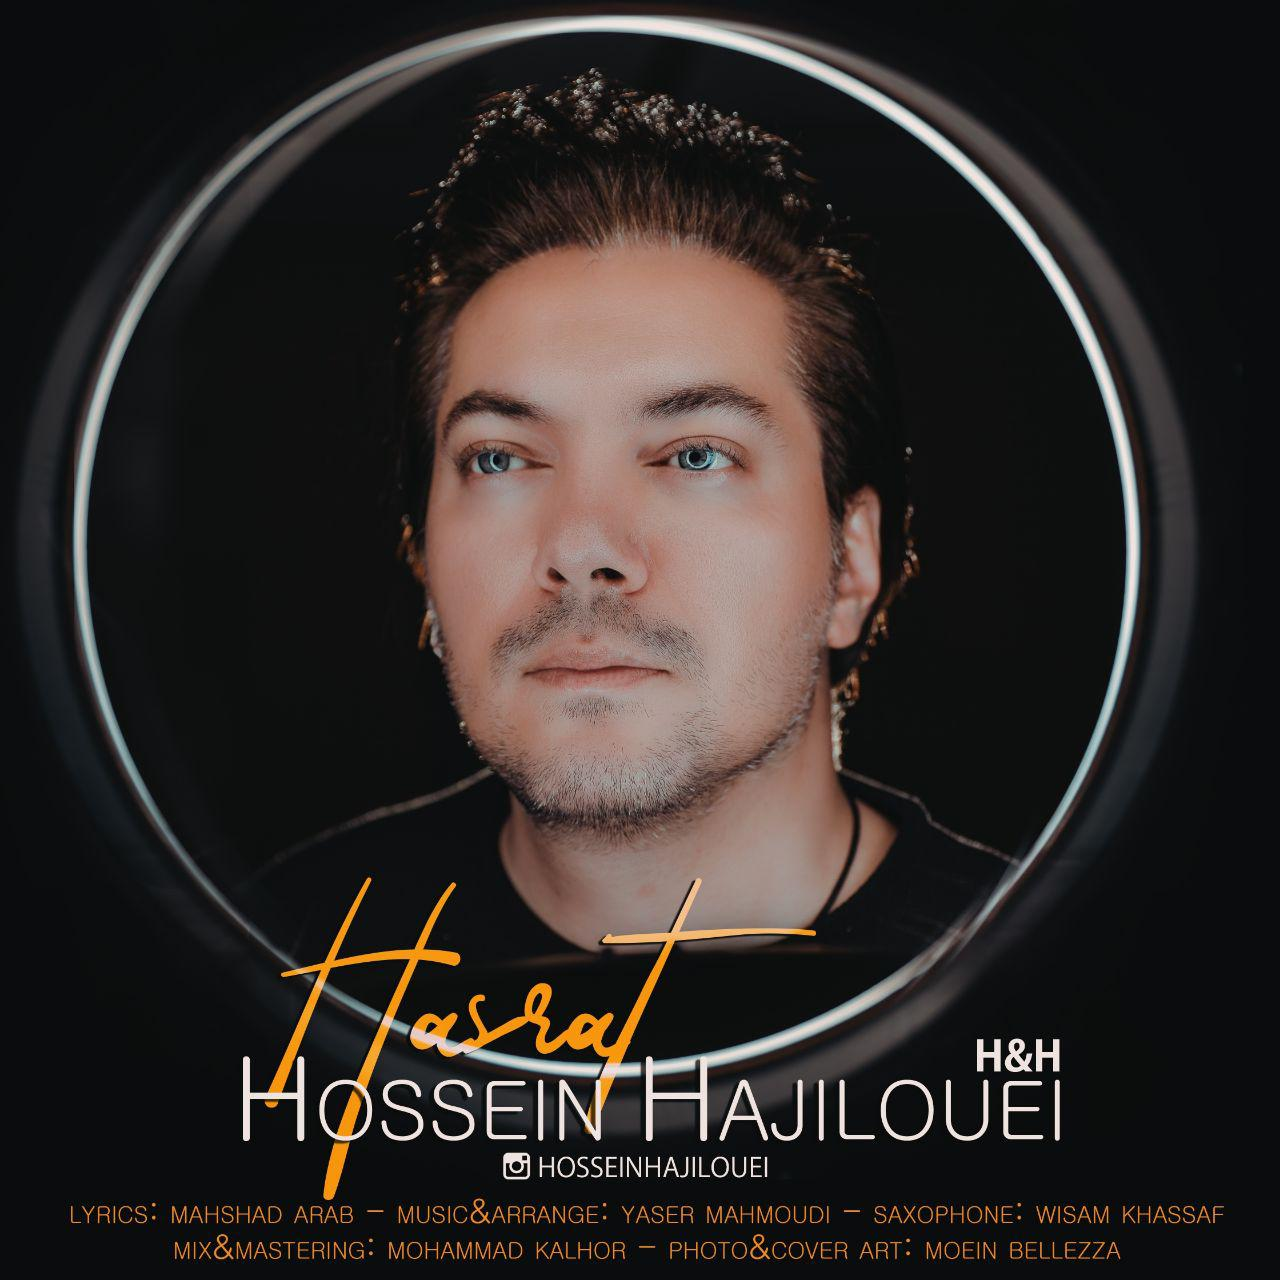 Hossein Hajilouei – Hasrat